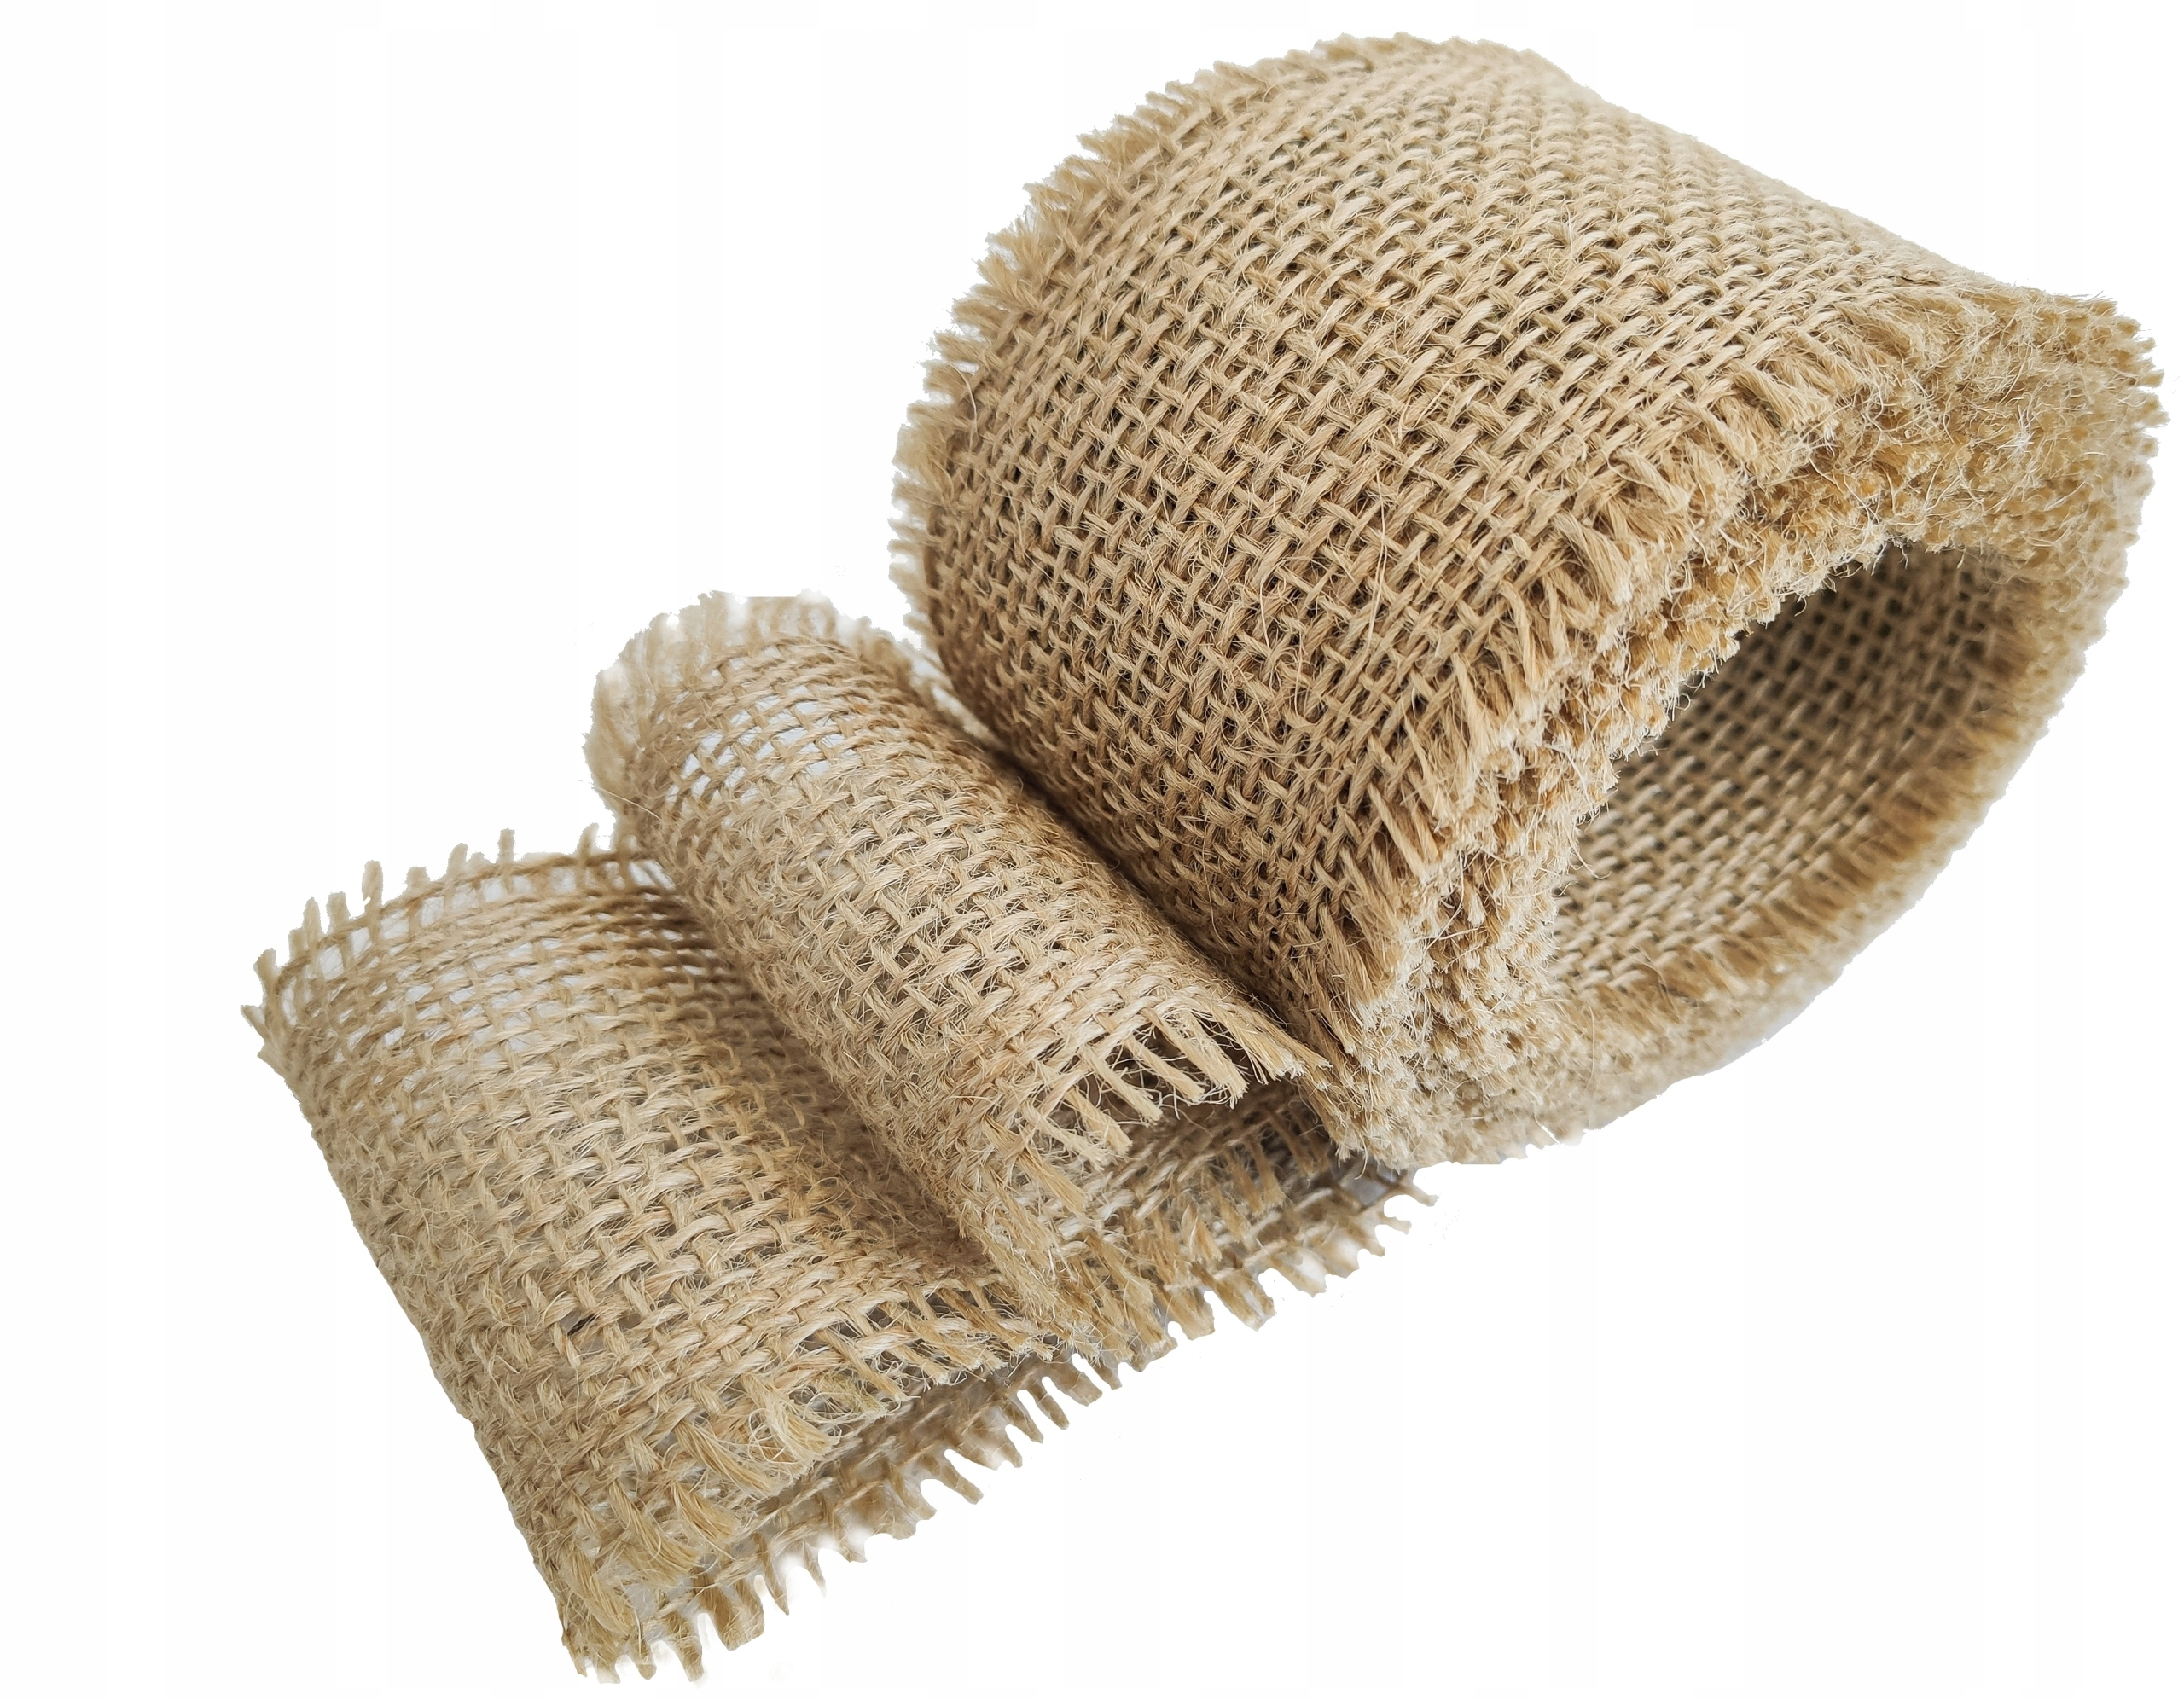 Juta naturalna - tkanina jutowa 5cm szerokości